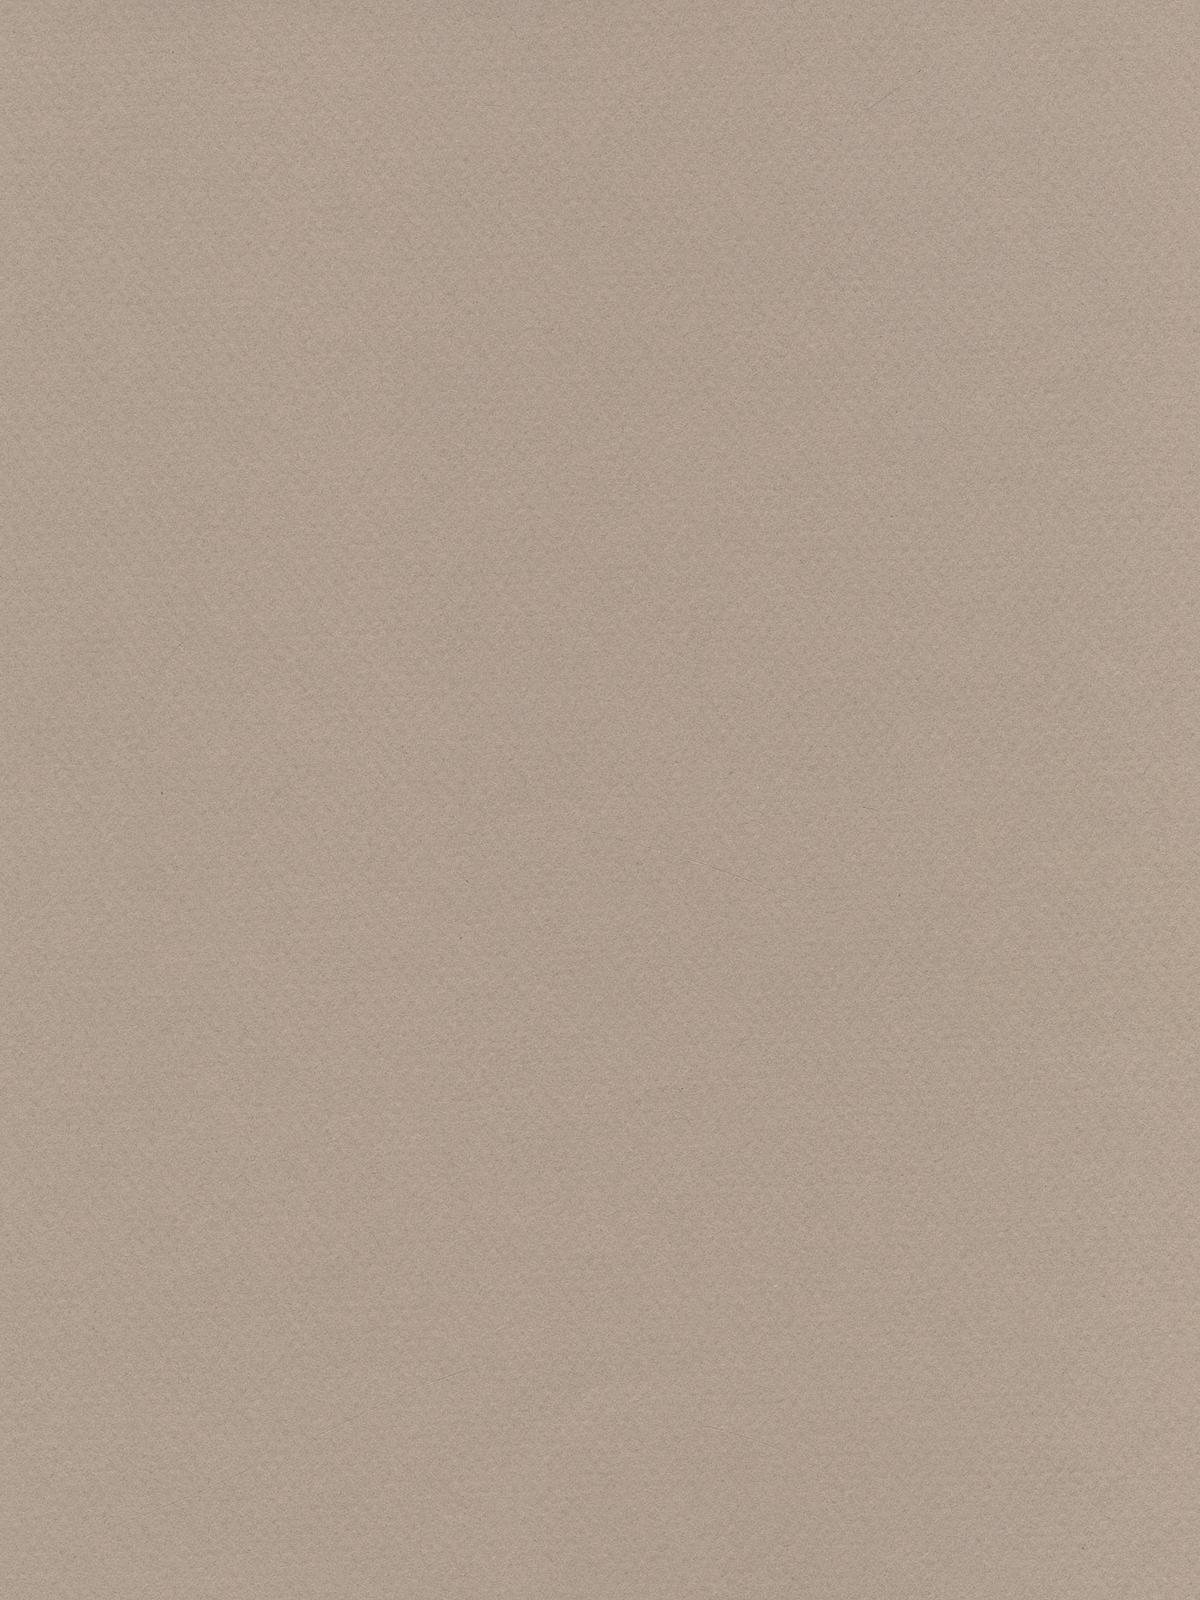 Mi-teintes Tinted Paper Pearl 8.5 In. X 11 In.